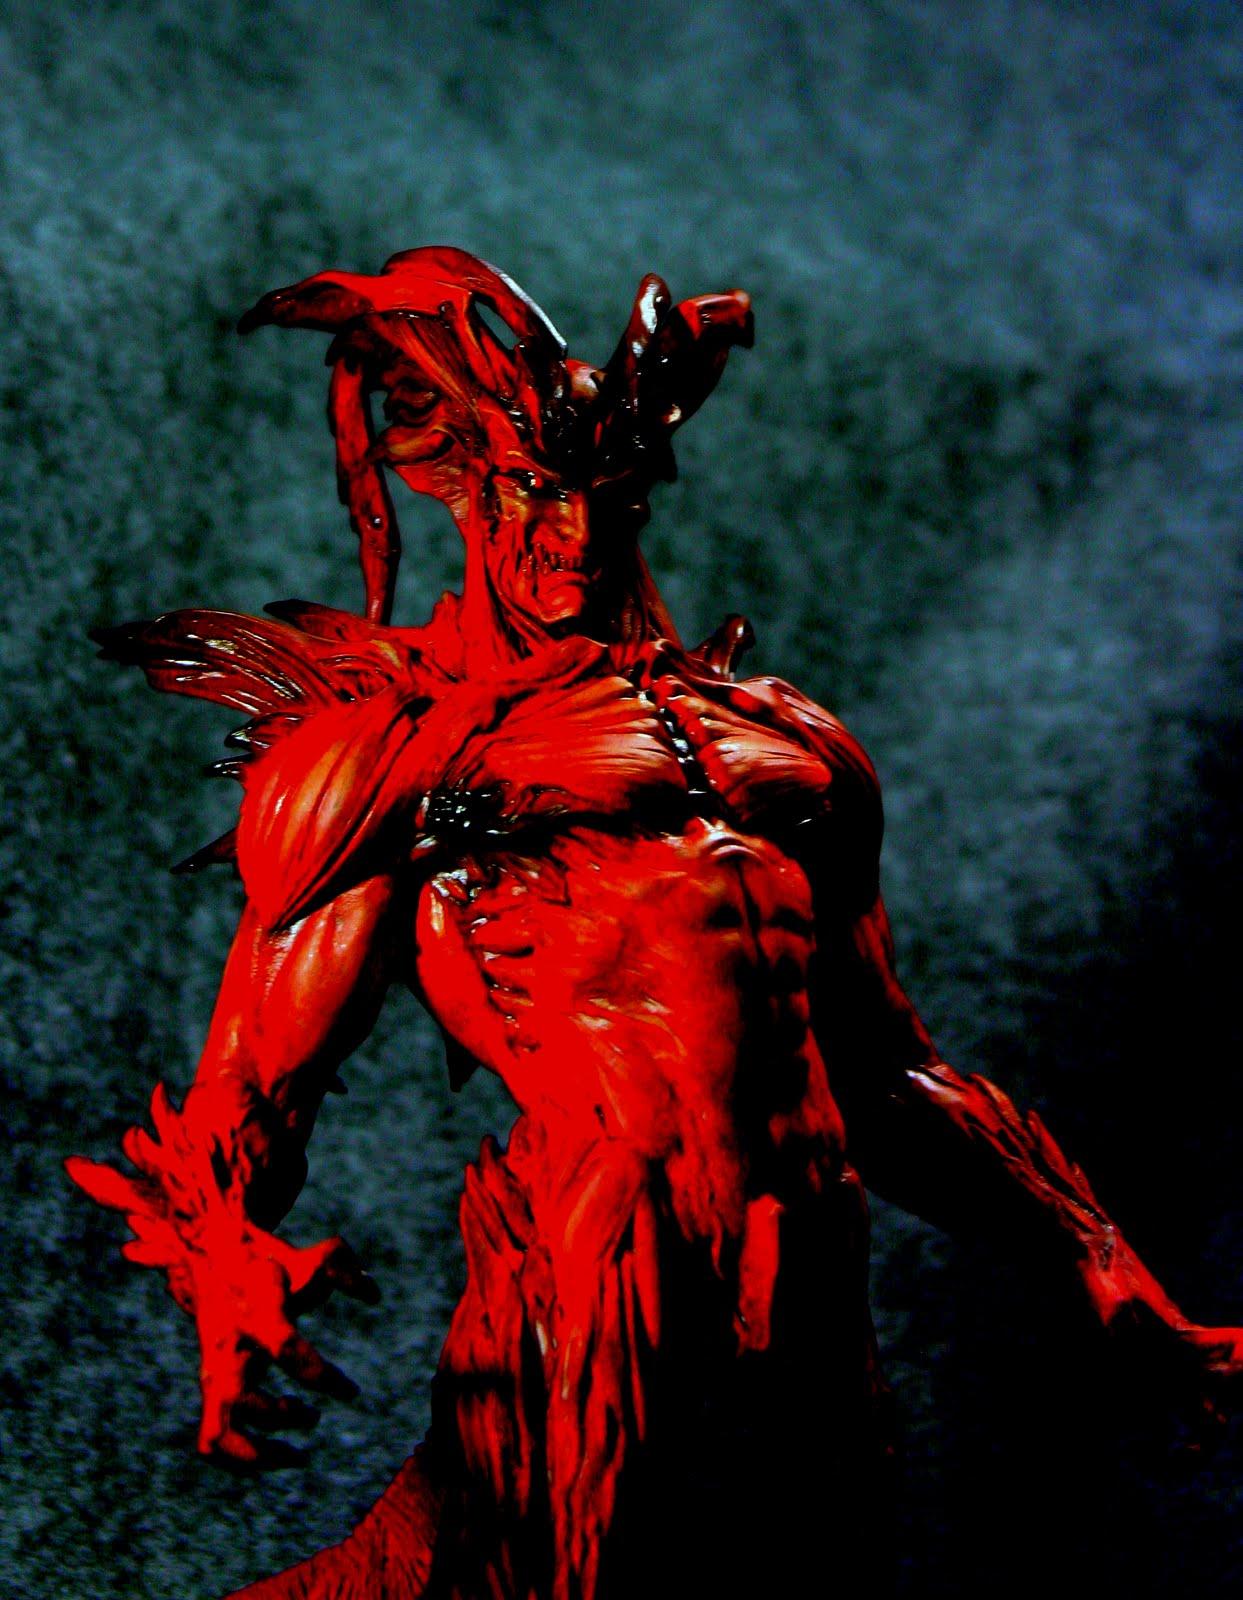 THE SEPULCHER: The Devil, Man